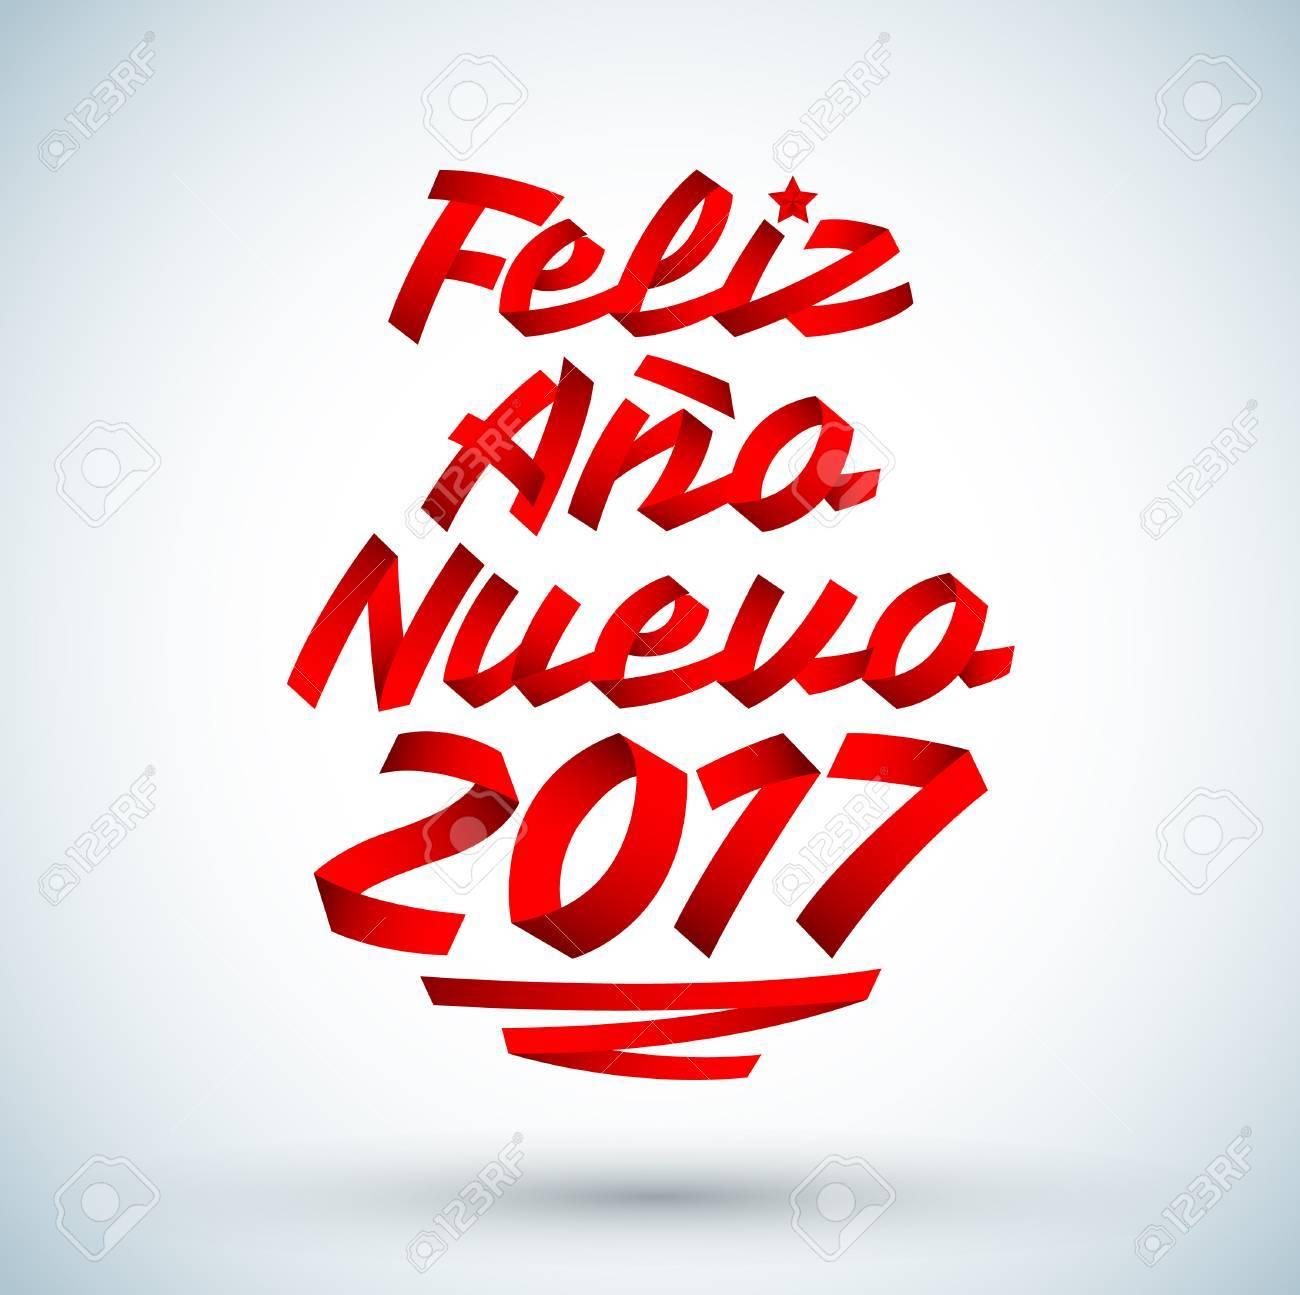 Feliz Ano Nuevo 2017 - Spanish Translation: Happy New Year 2017,.. Royalty  Free Cliparts, Vectors, And Stock Illustration. Image 68606529.